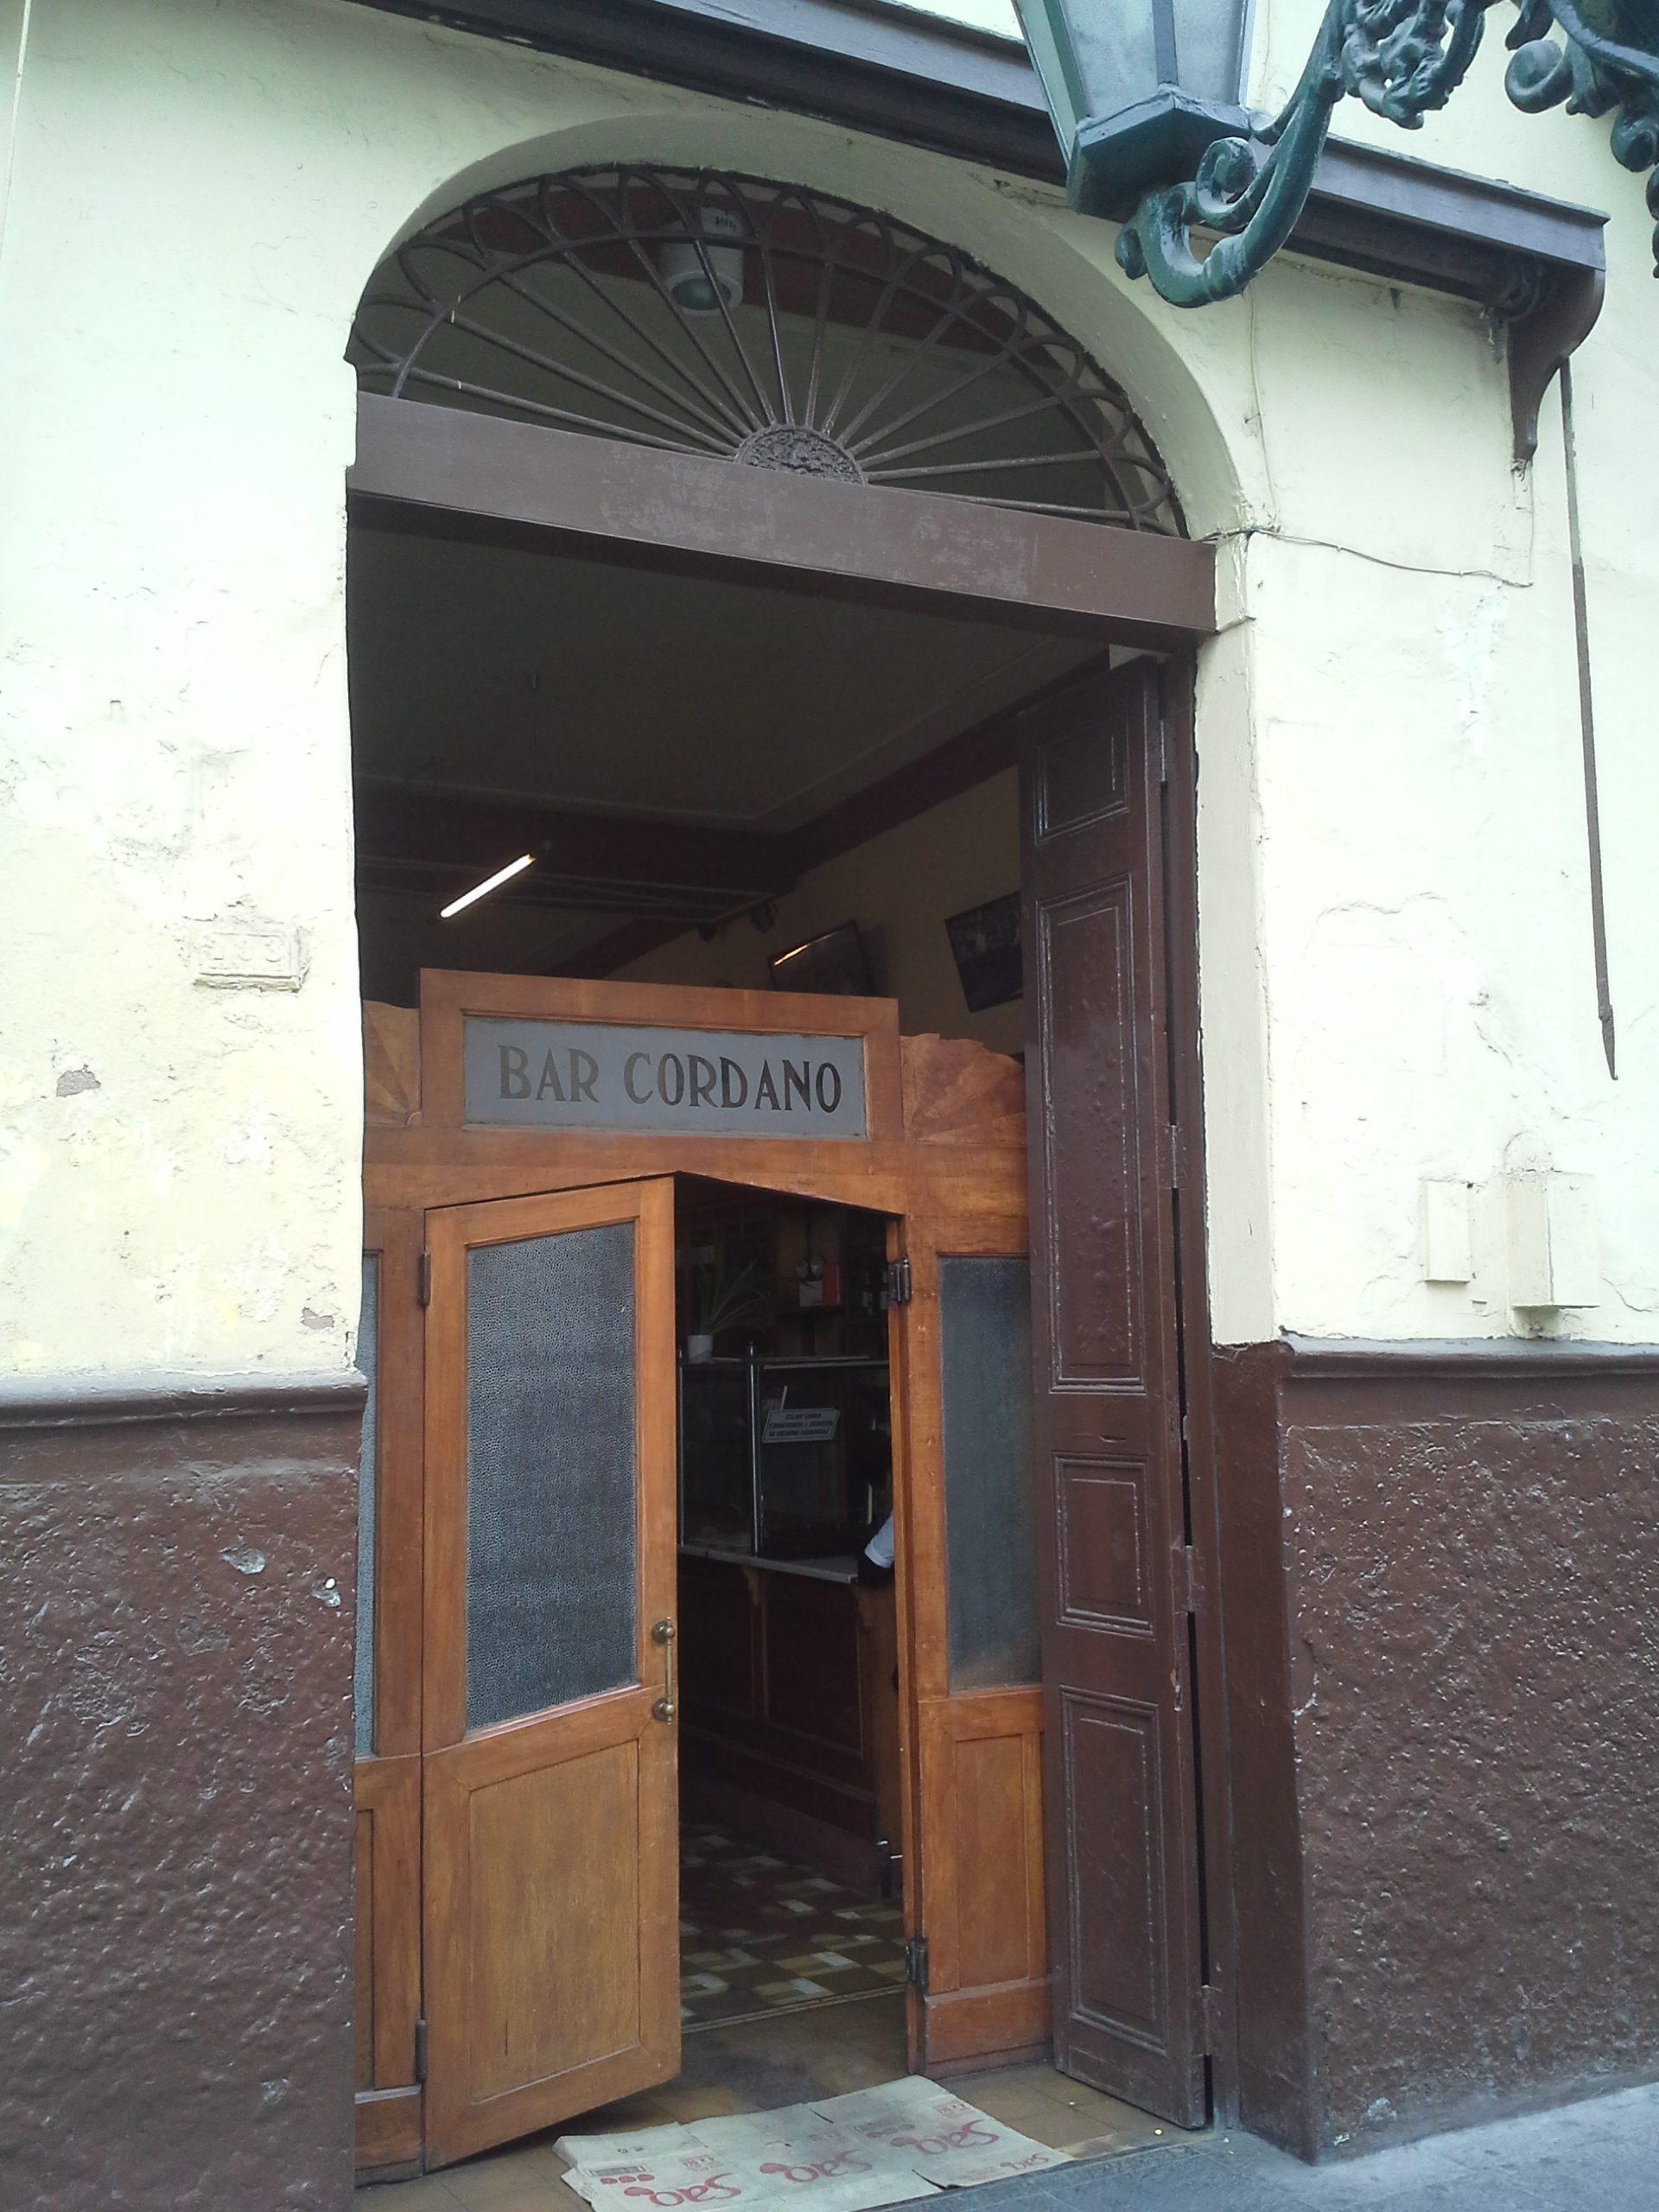 Cordano restaurant